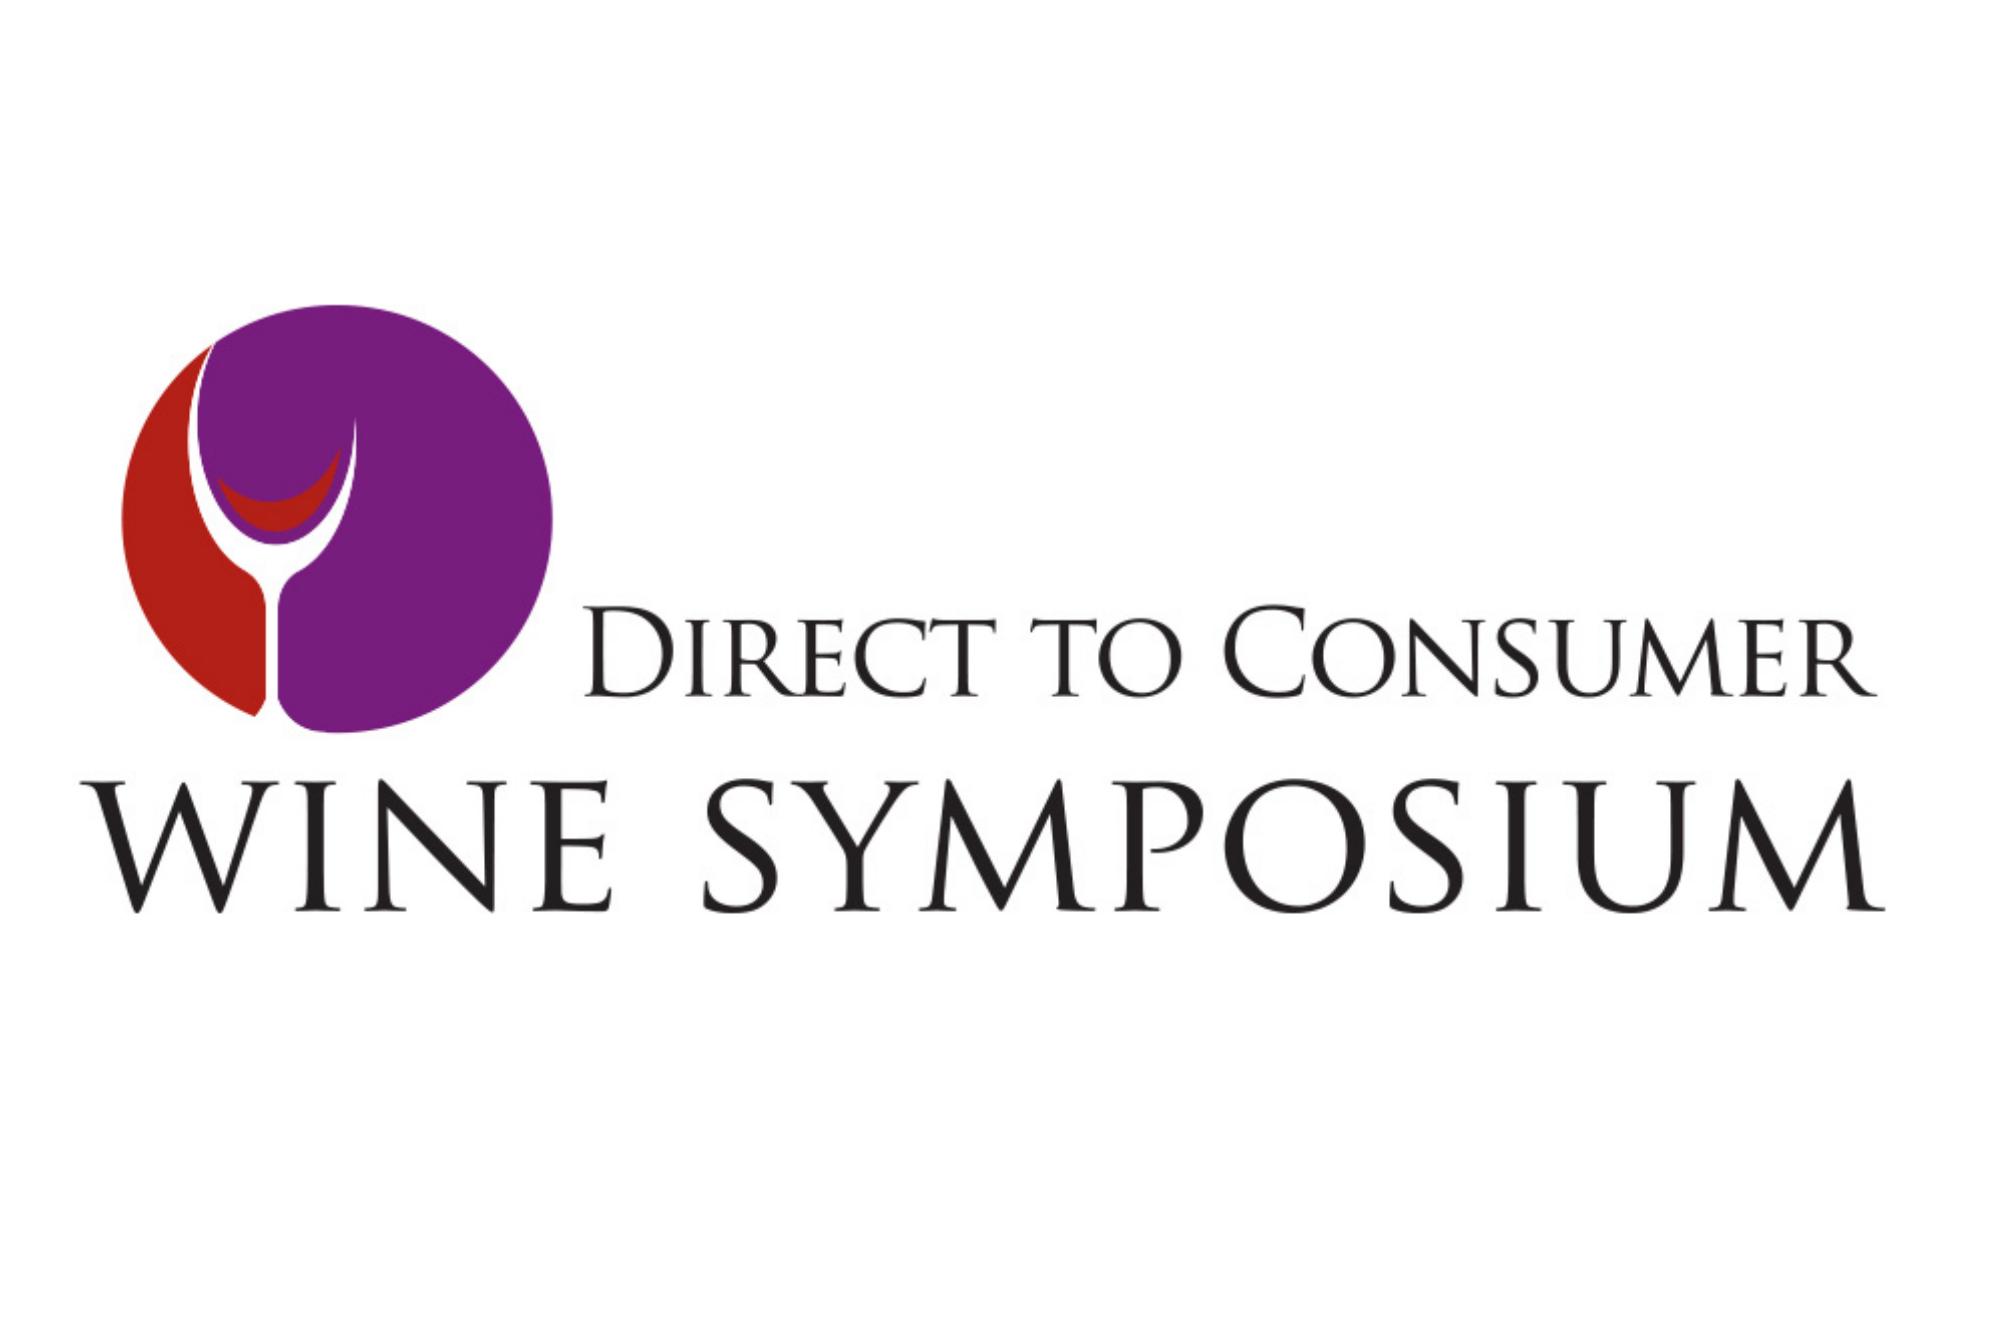 DTC Wine Symposium Logo